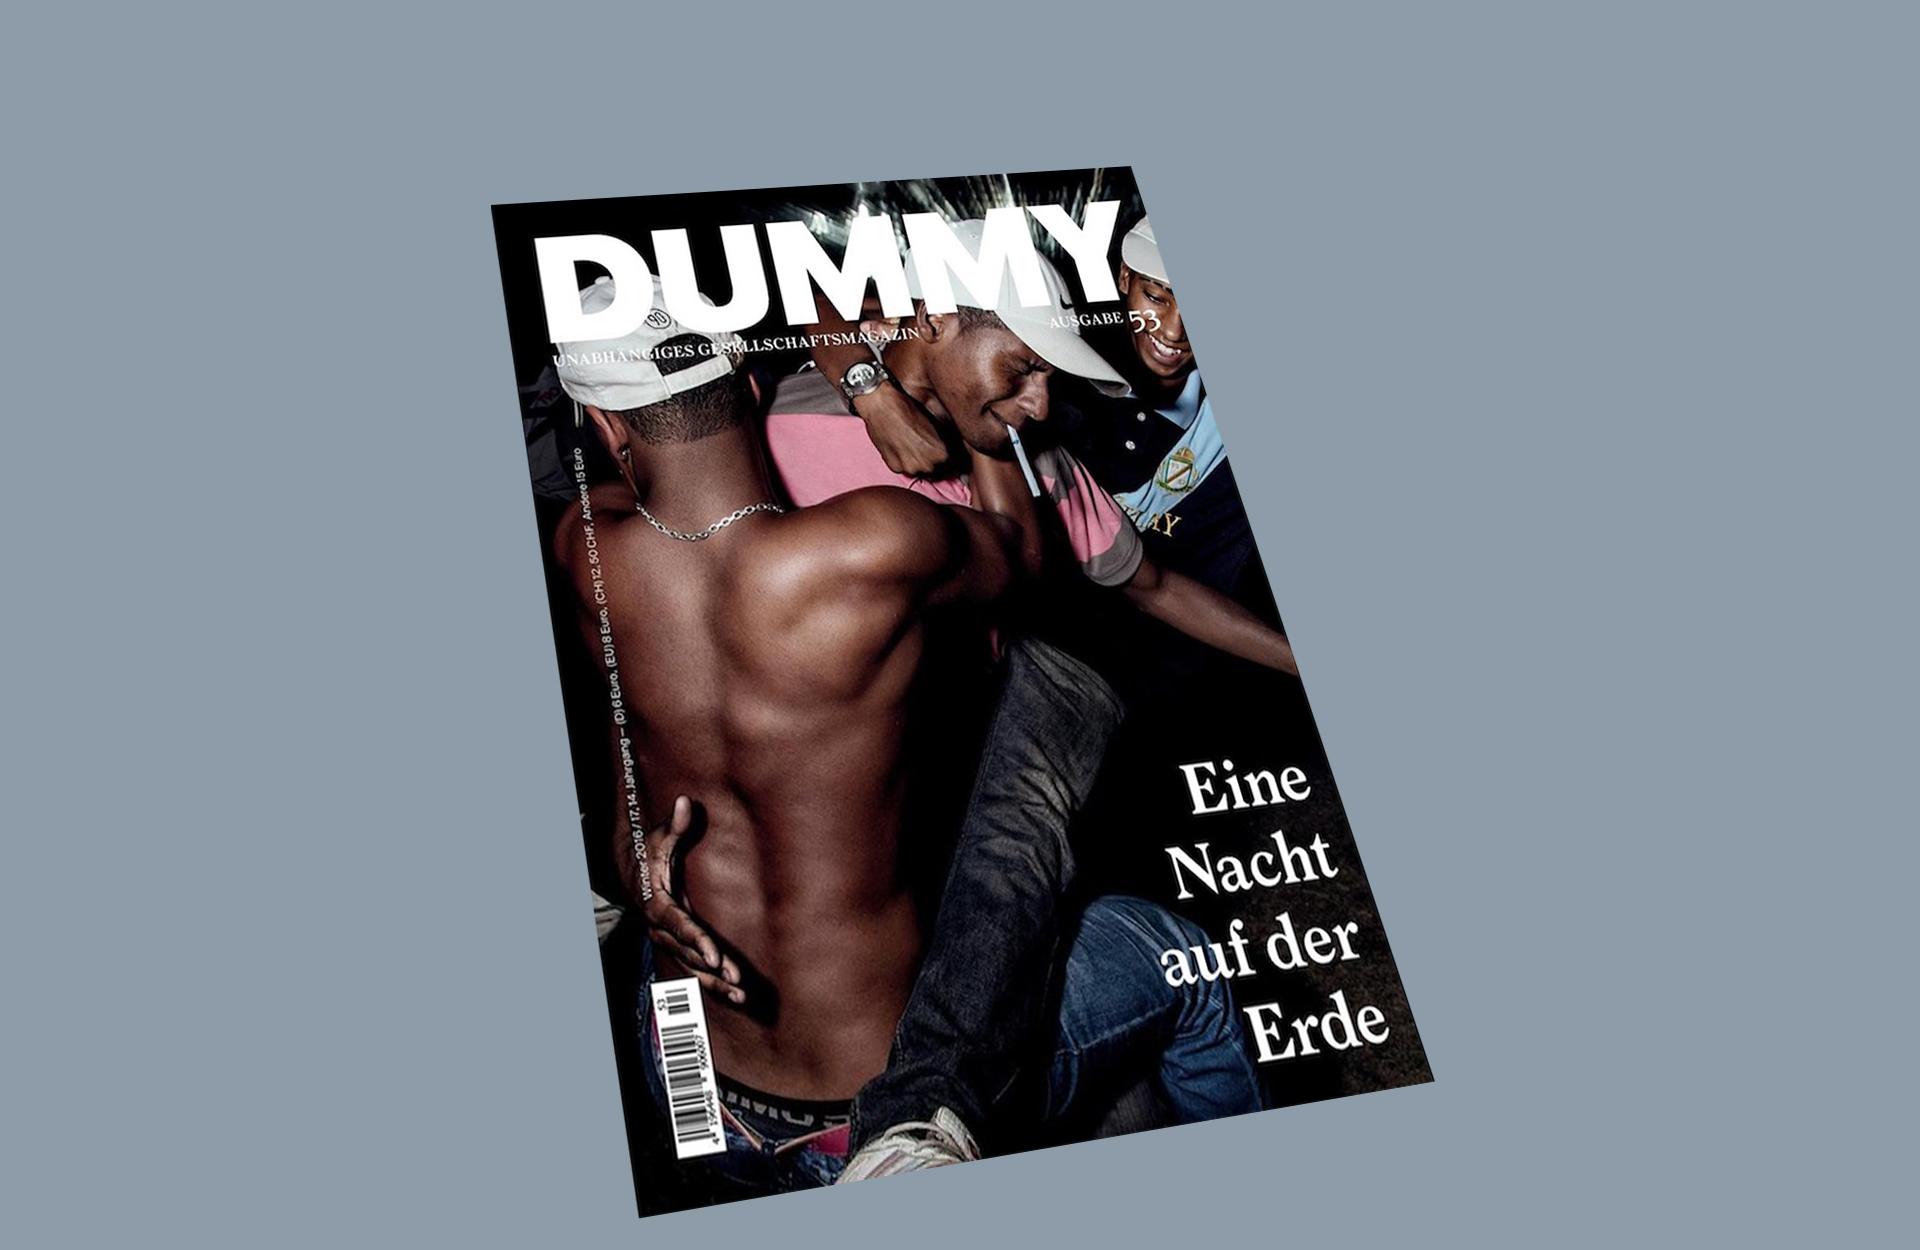 dummy-nacht-1